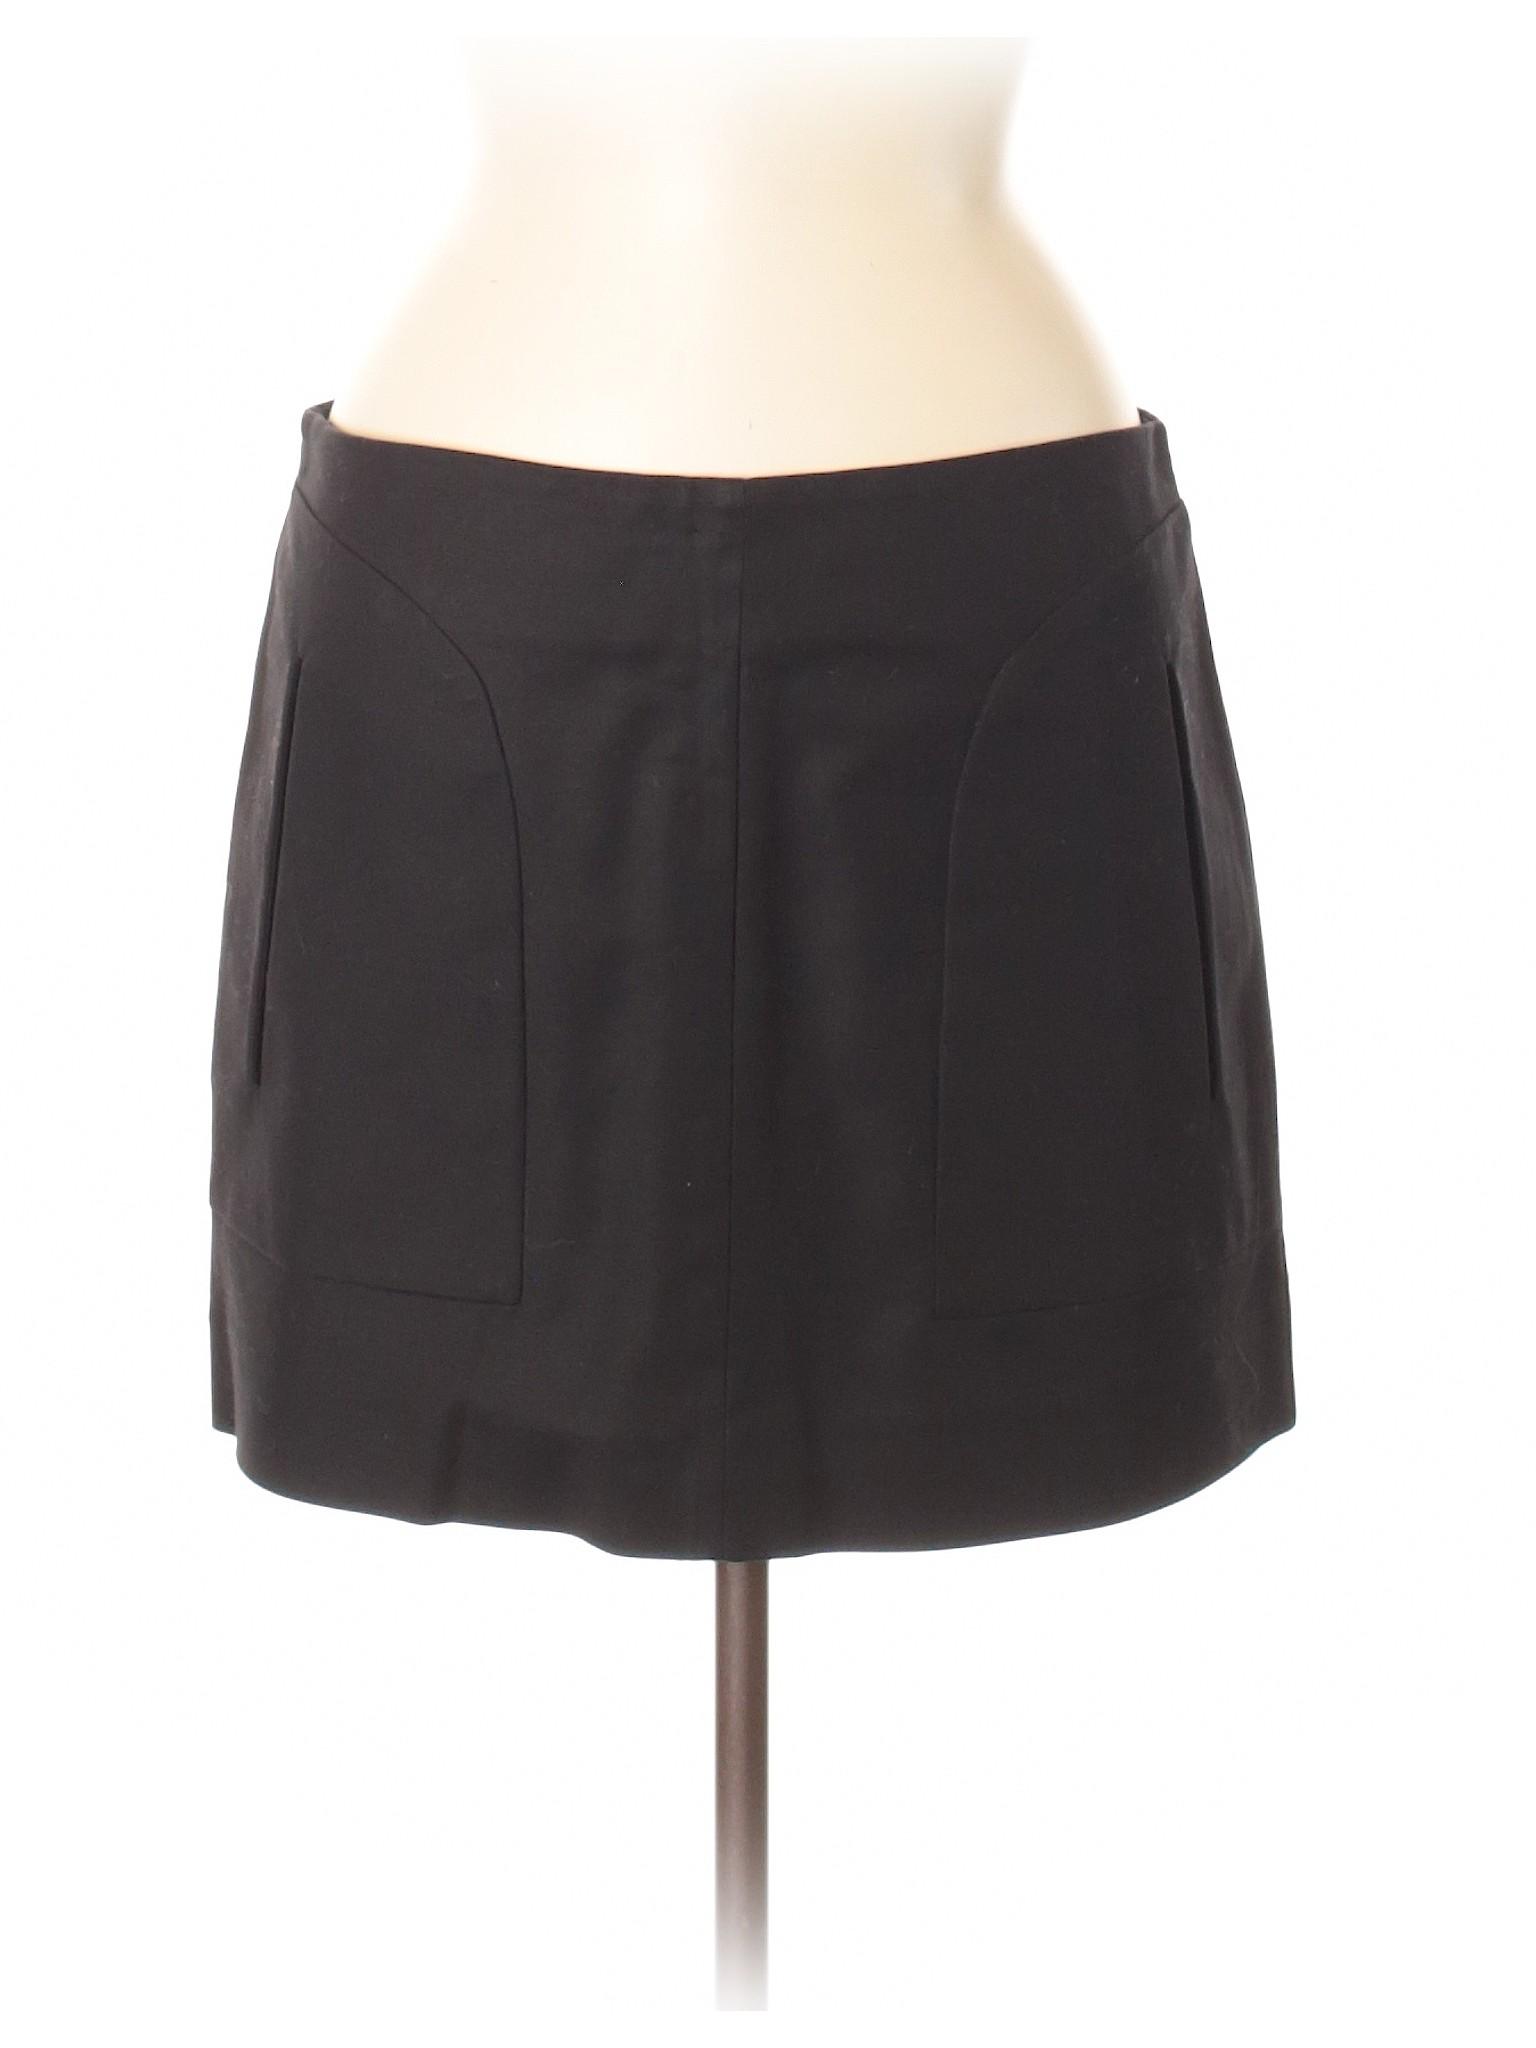 Boutique Skirt Joe Casual leisure Fresh qpqaY